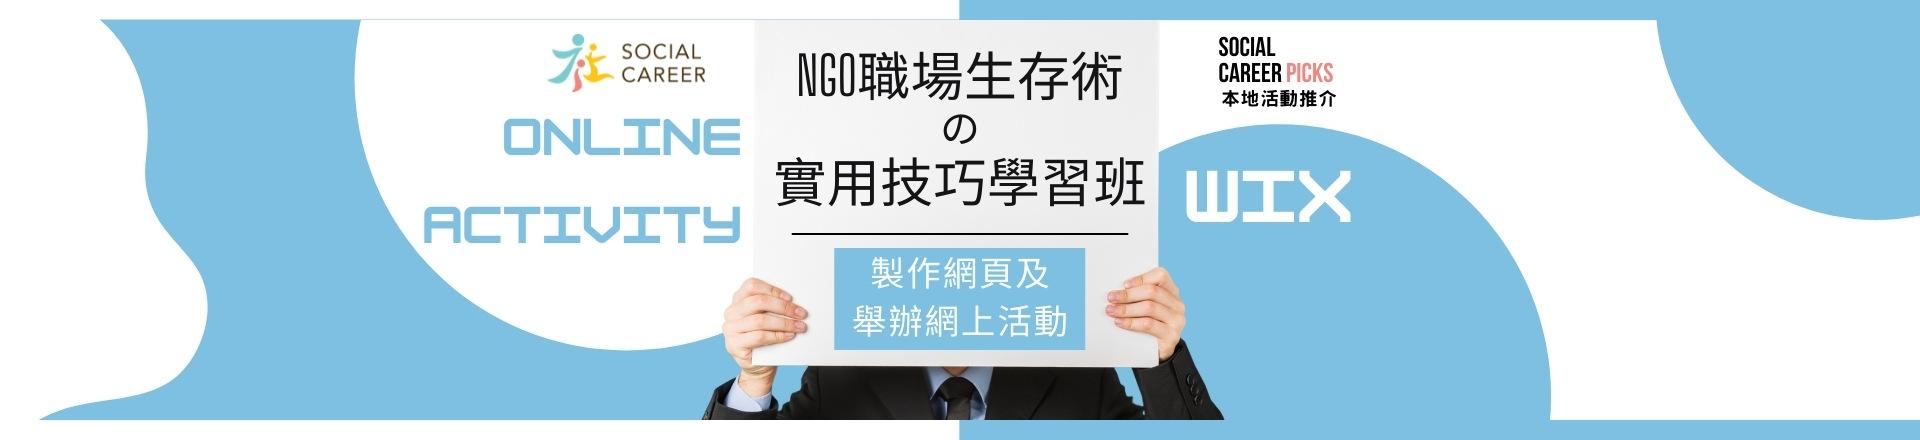 【NGO轉型限定】如何整網頁?|免費網頁製作教學及舉辦網上活動分享會